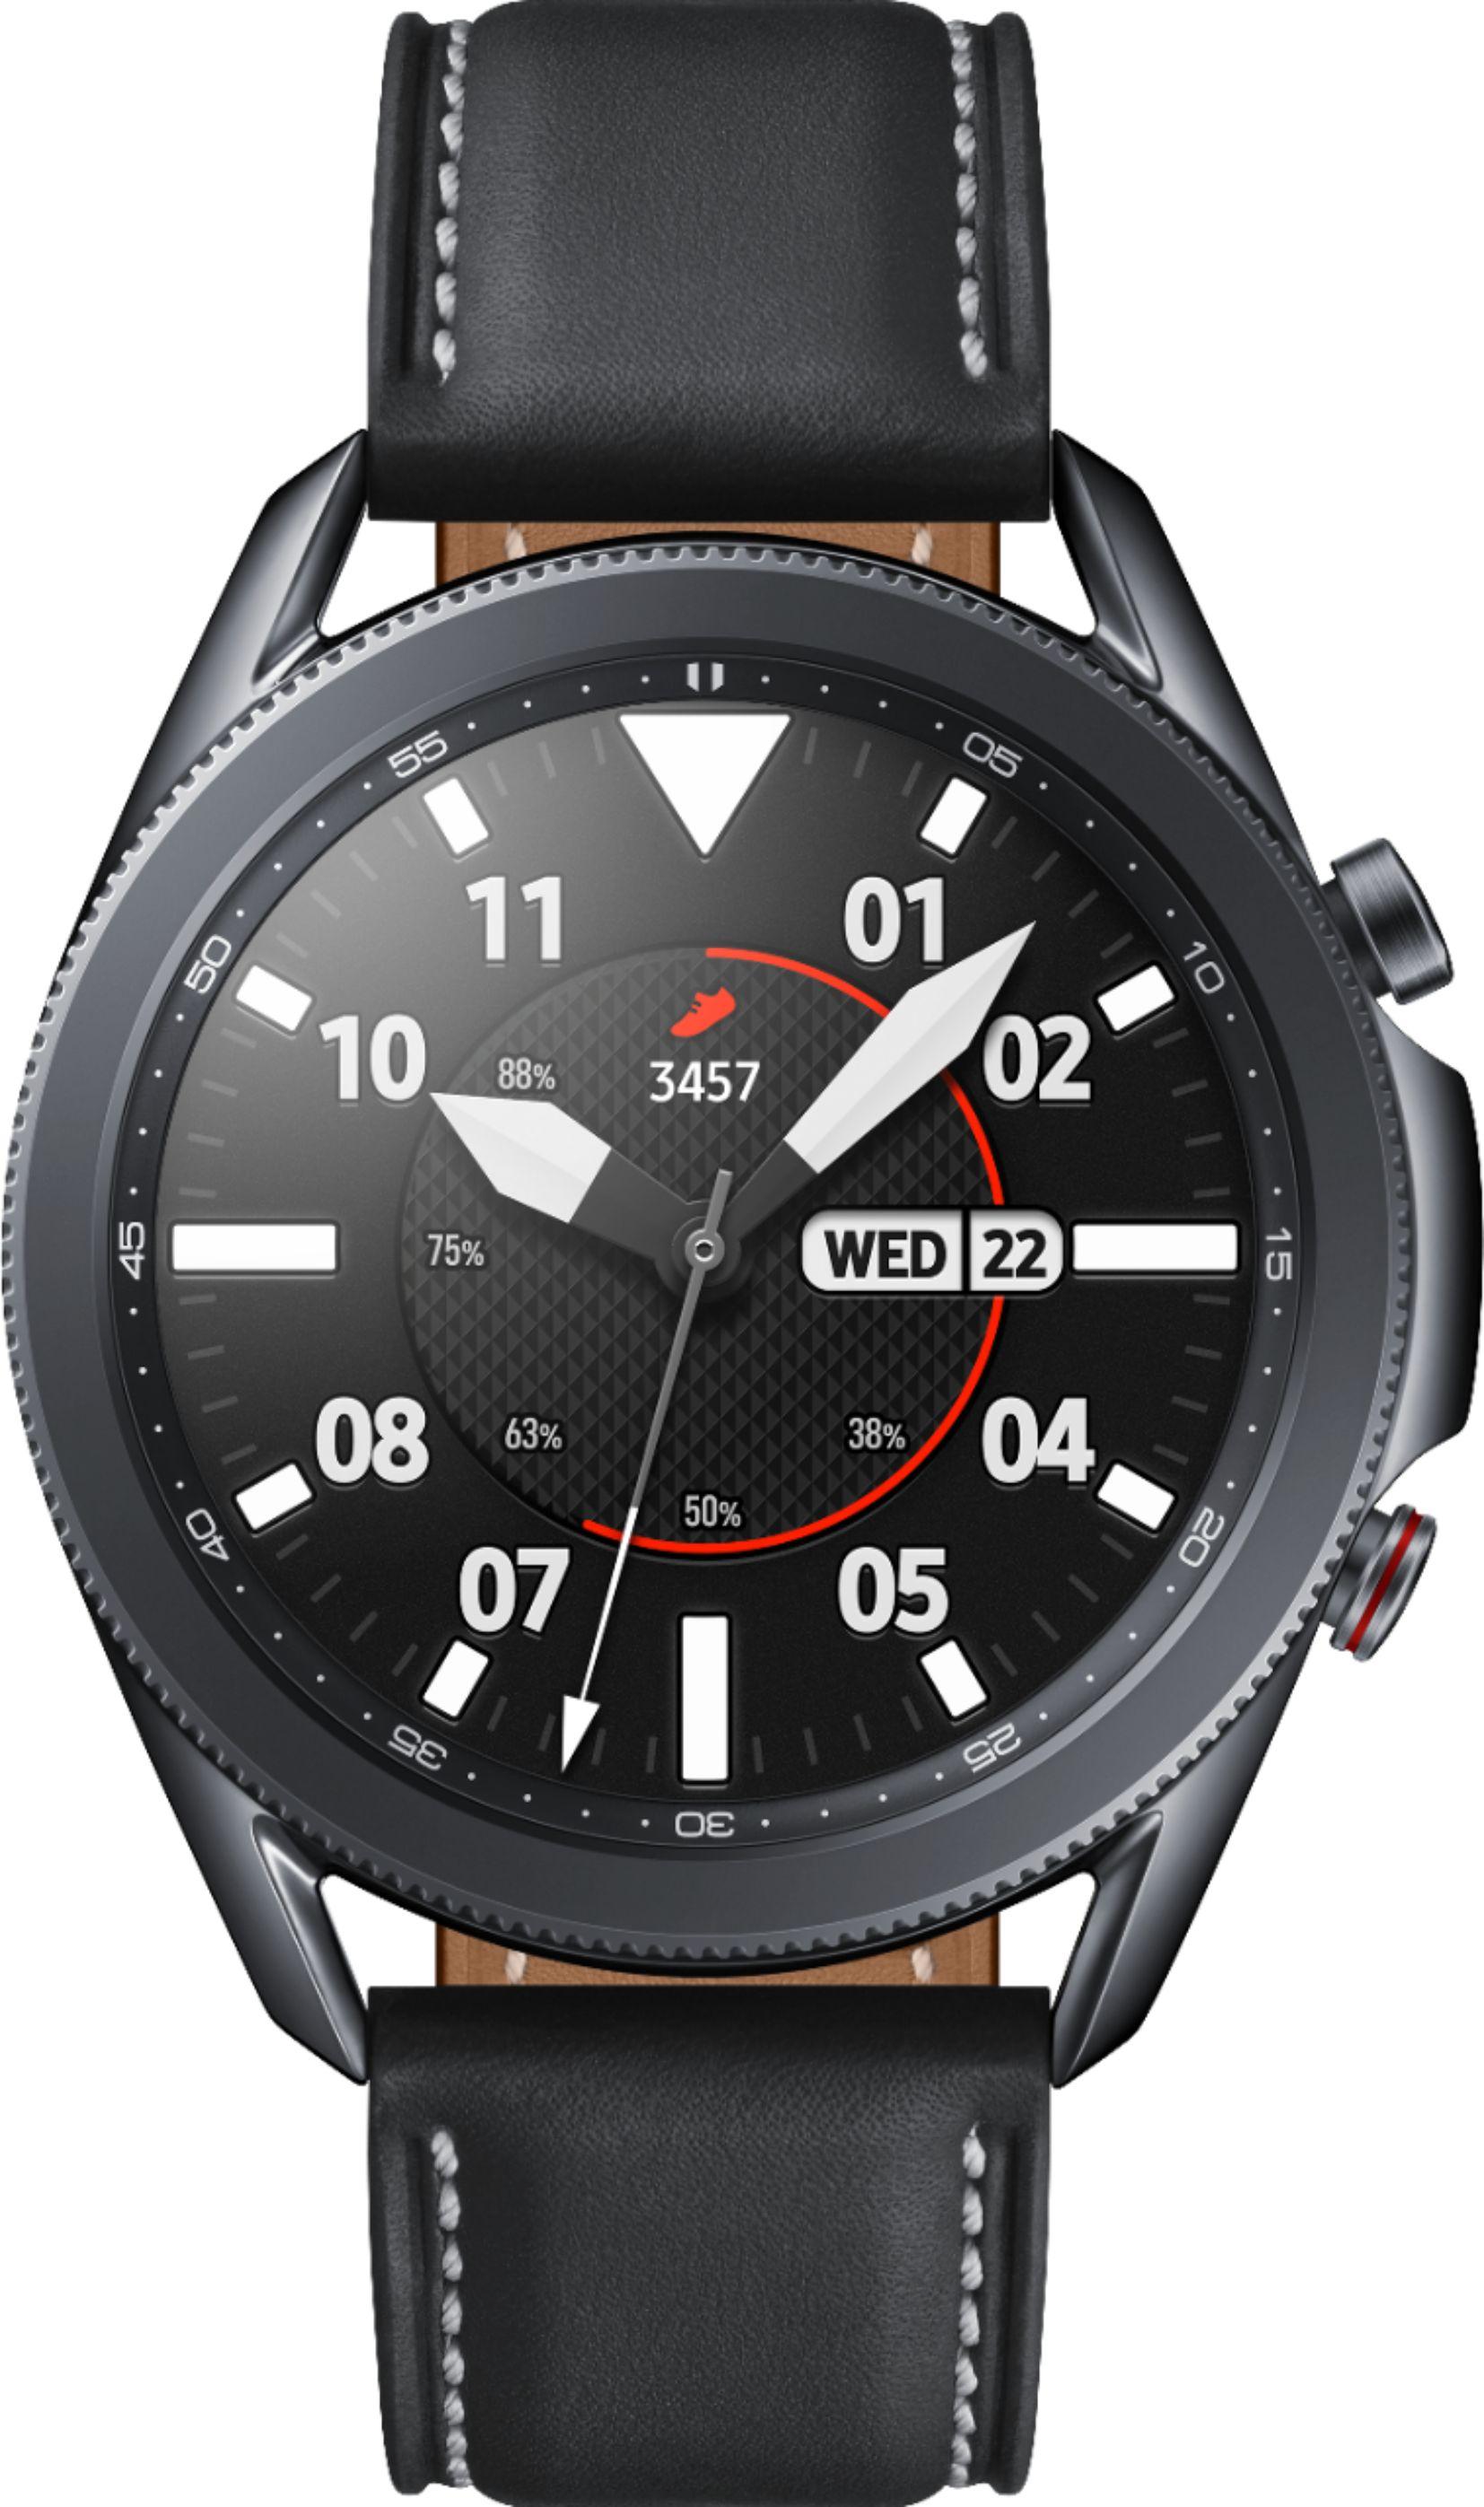 Samsung Galaxy Watch 3 with Unlocked LTE $379